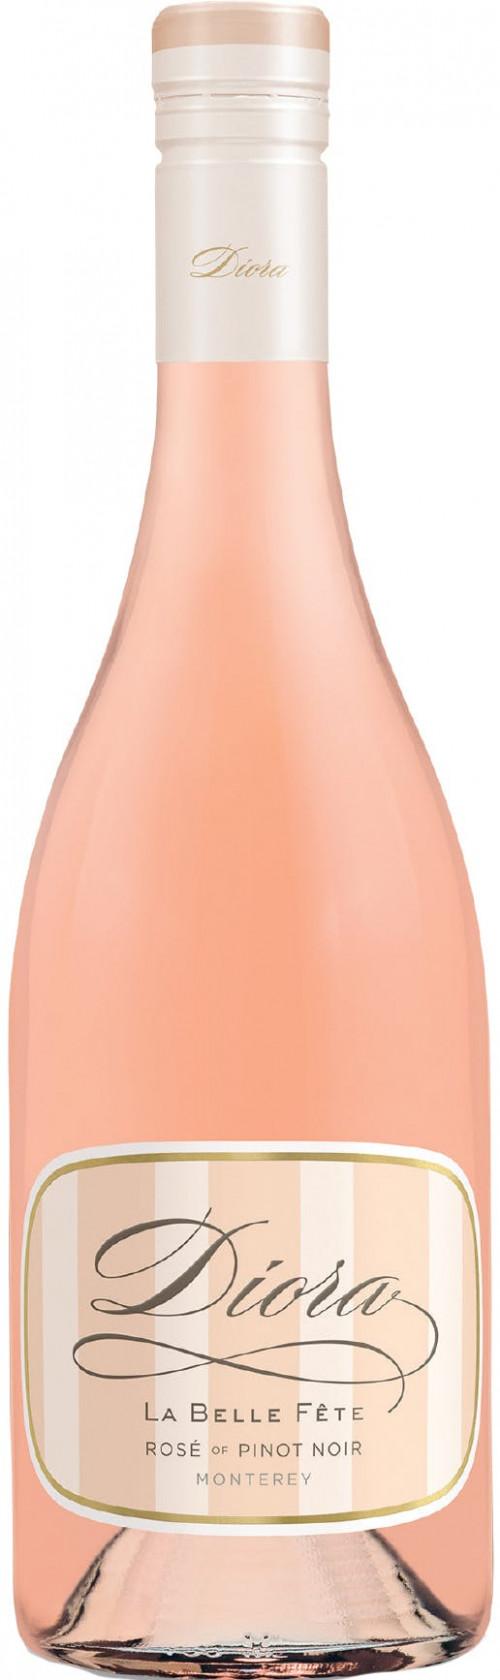 2020 Diora Rose Of Pinot Noir La Belle Fete 750ml